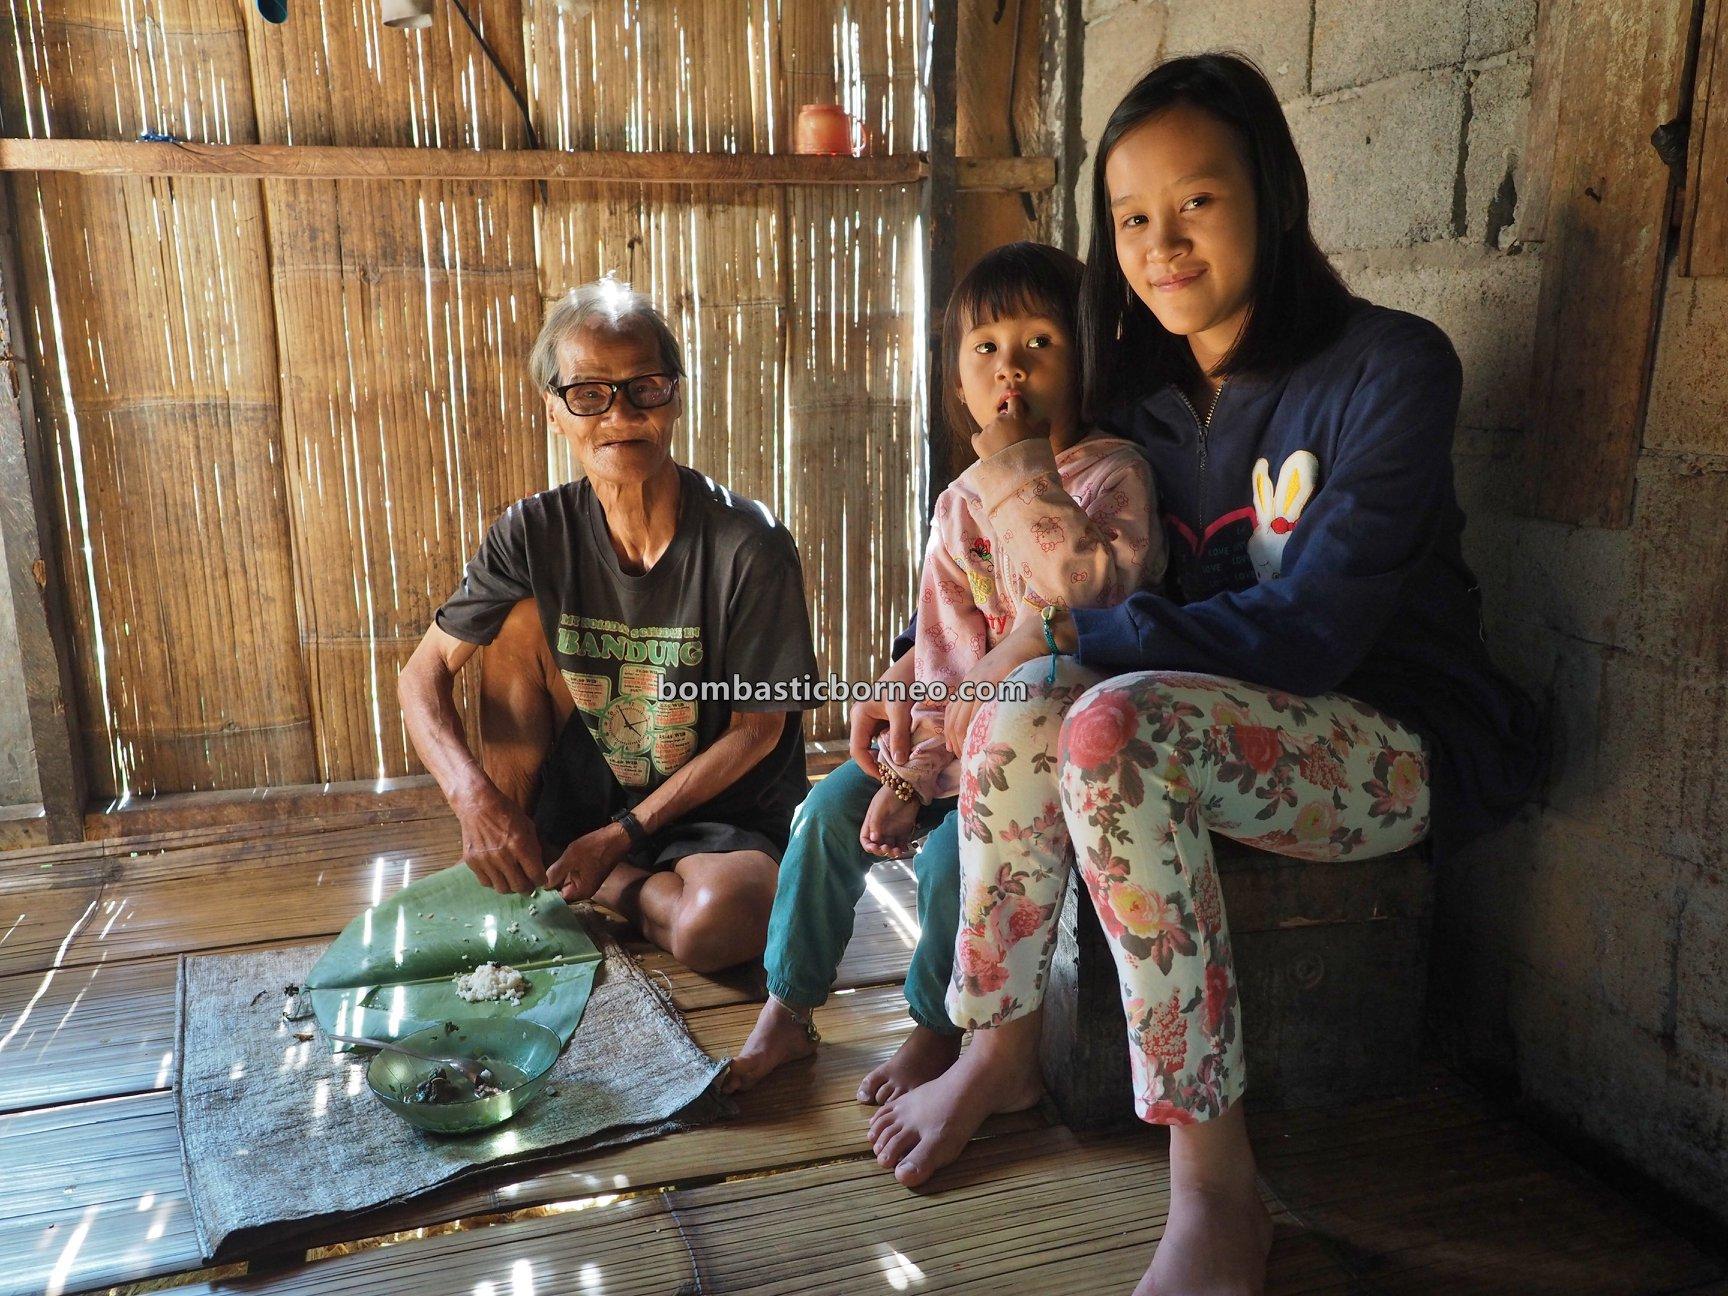 Sungkung Anep, traditional, indigenous, Kalimantan Barat, Siding, Dayak Bidayuh, tribal, Obyek wisata, Tourism, Travel guide, Trans Border, Borneo, 婆罗洲土著部落, 印尼西加里曼丹, 孟加映比达友族